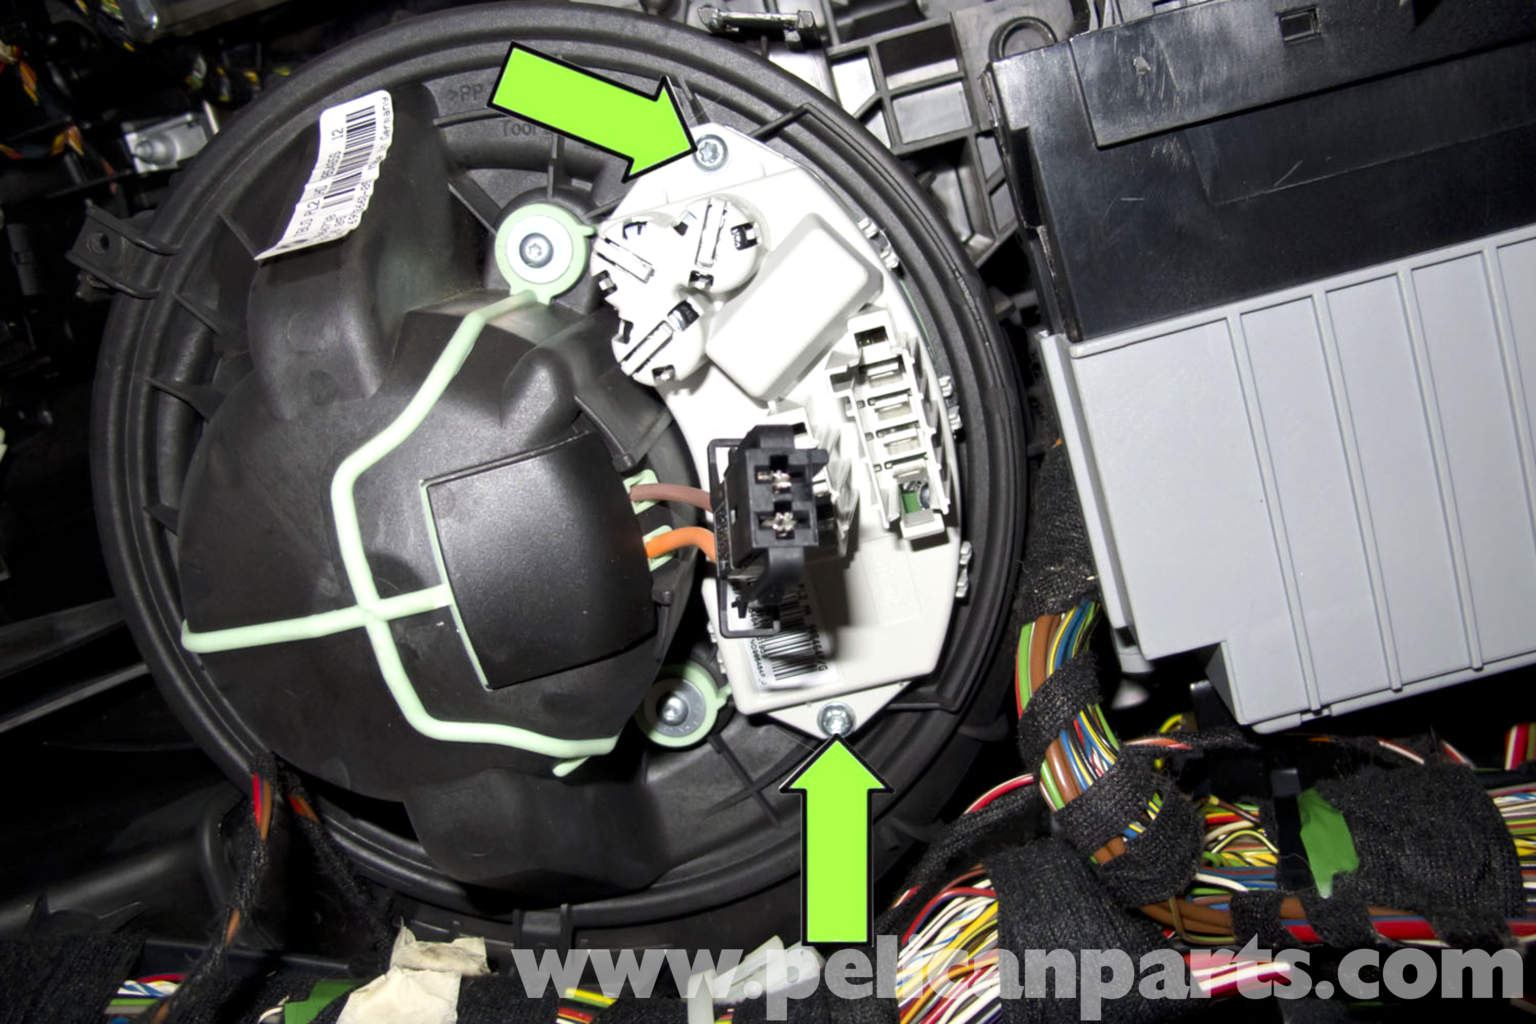 e90 bmw start stop wiring diagram    bmw       e90    blower motor replacement e91  e92  e93 pelican     bmw       e90    blower motor replacement e91  e92  e93 pelican